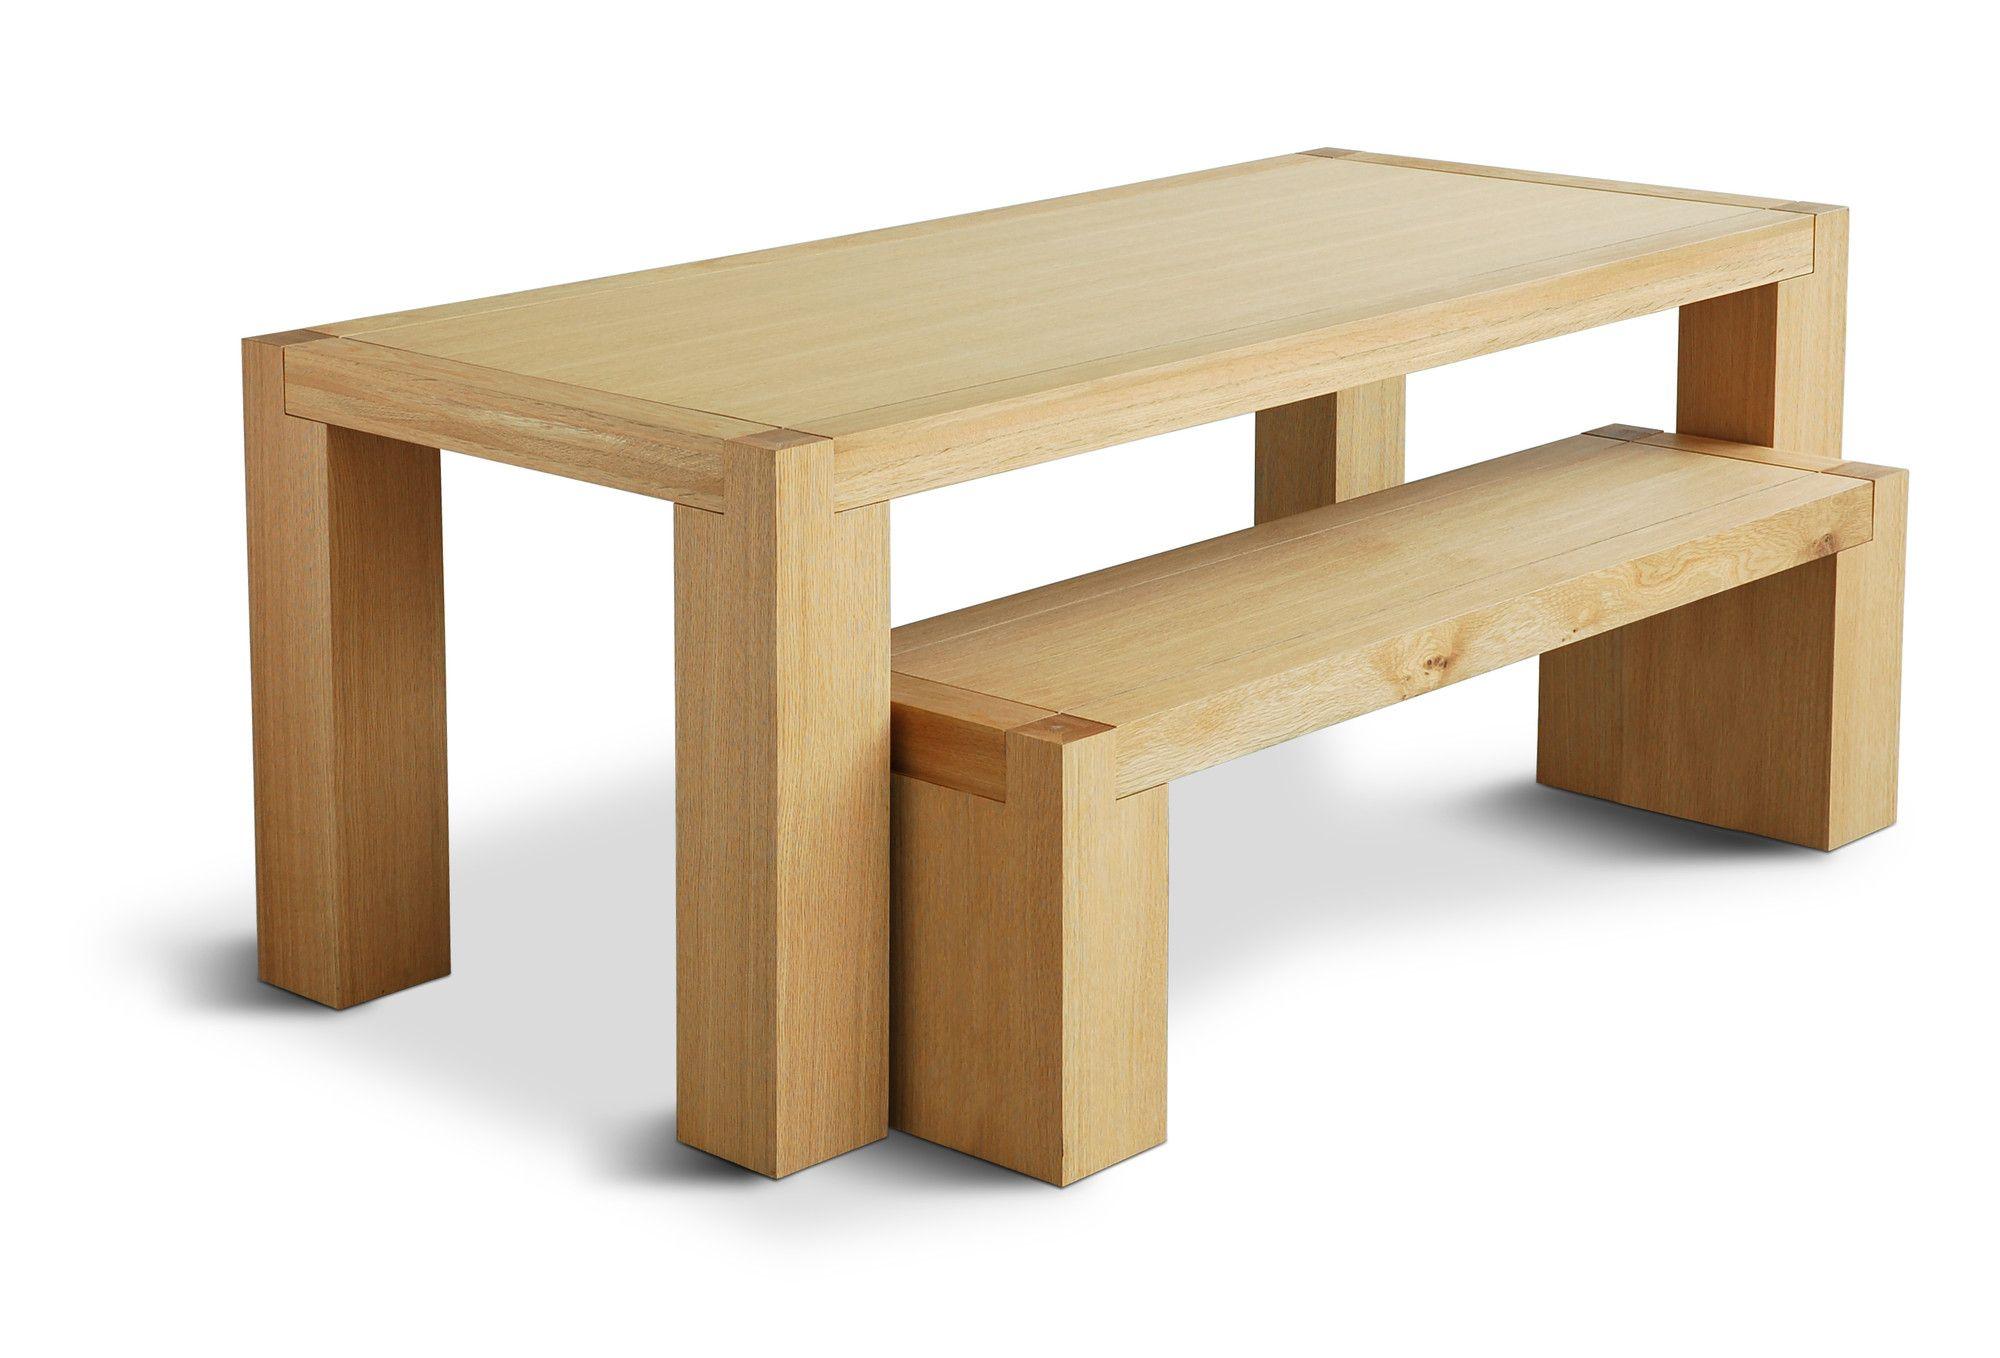 Gus modern chunk dining table